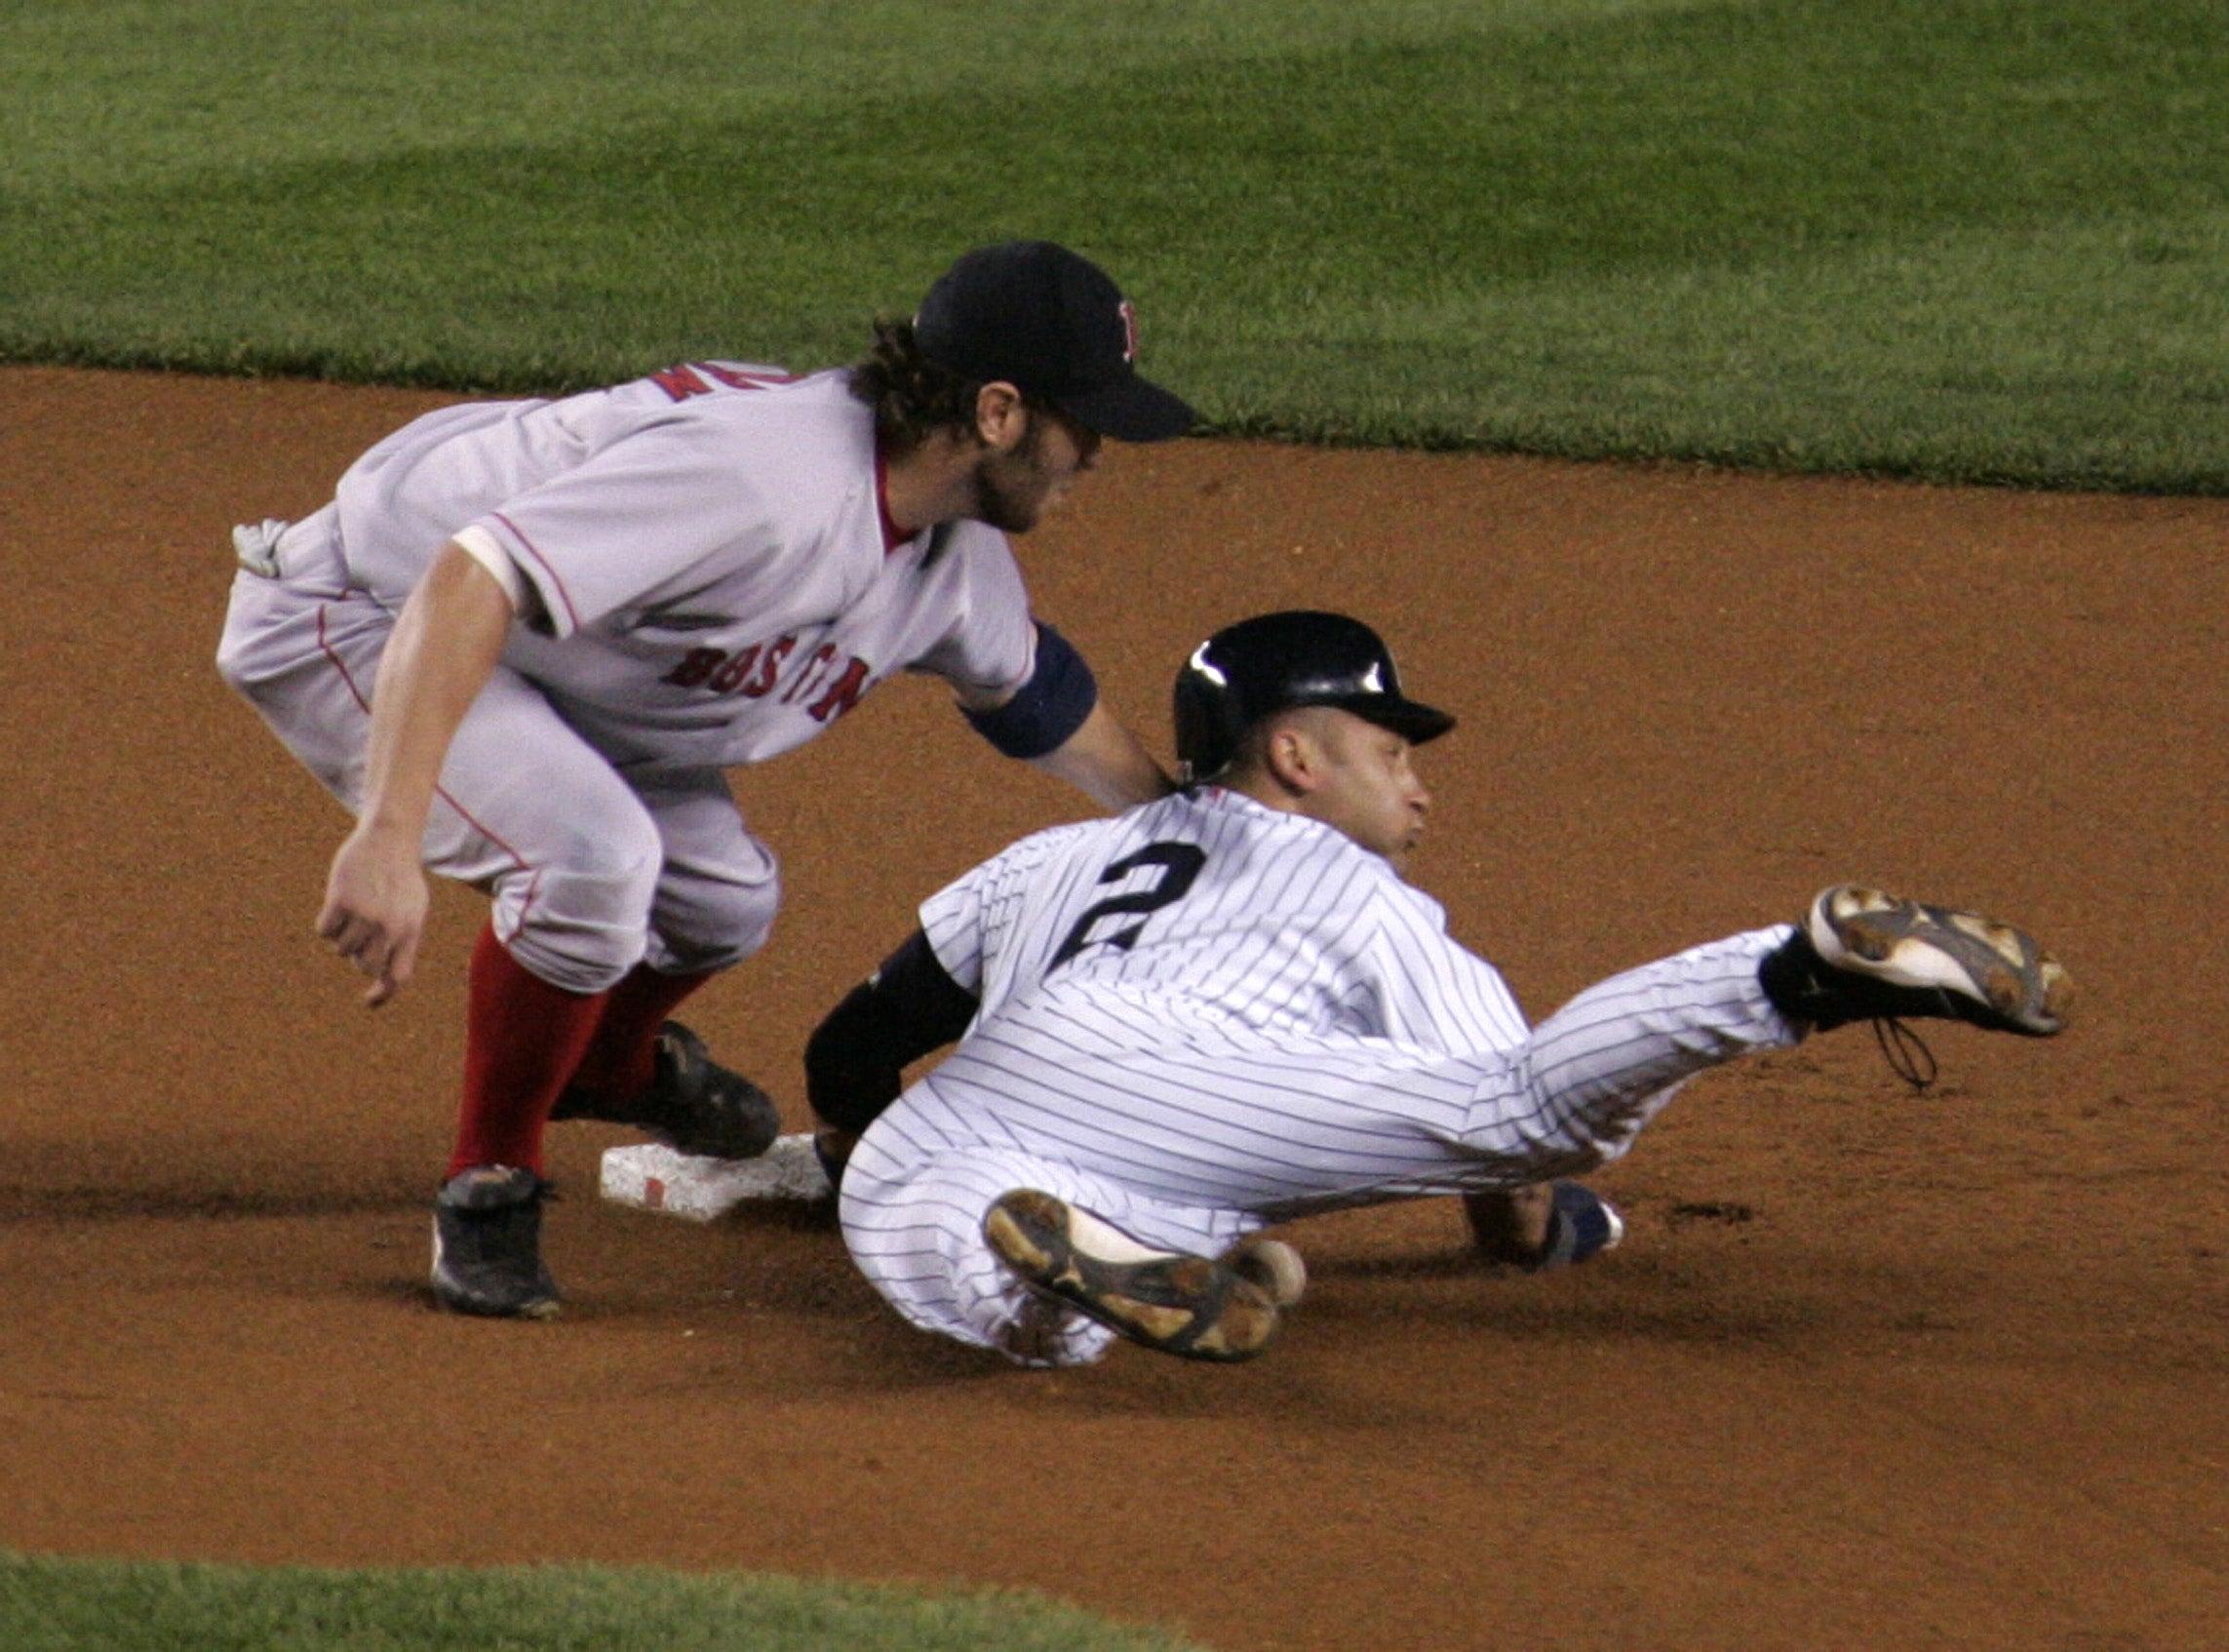 Jeter steals second base is-1289393.jpg